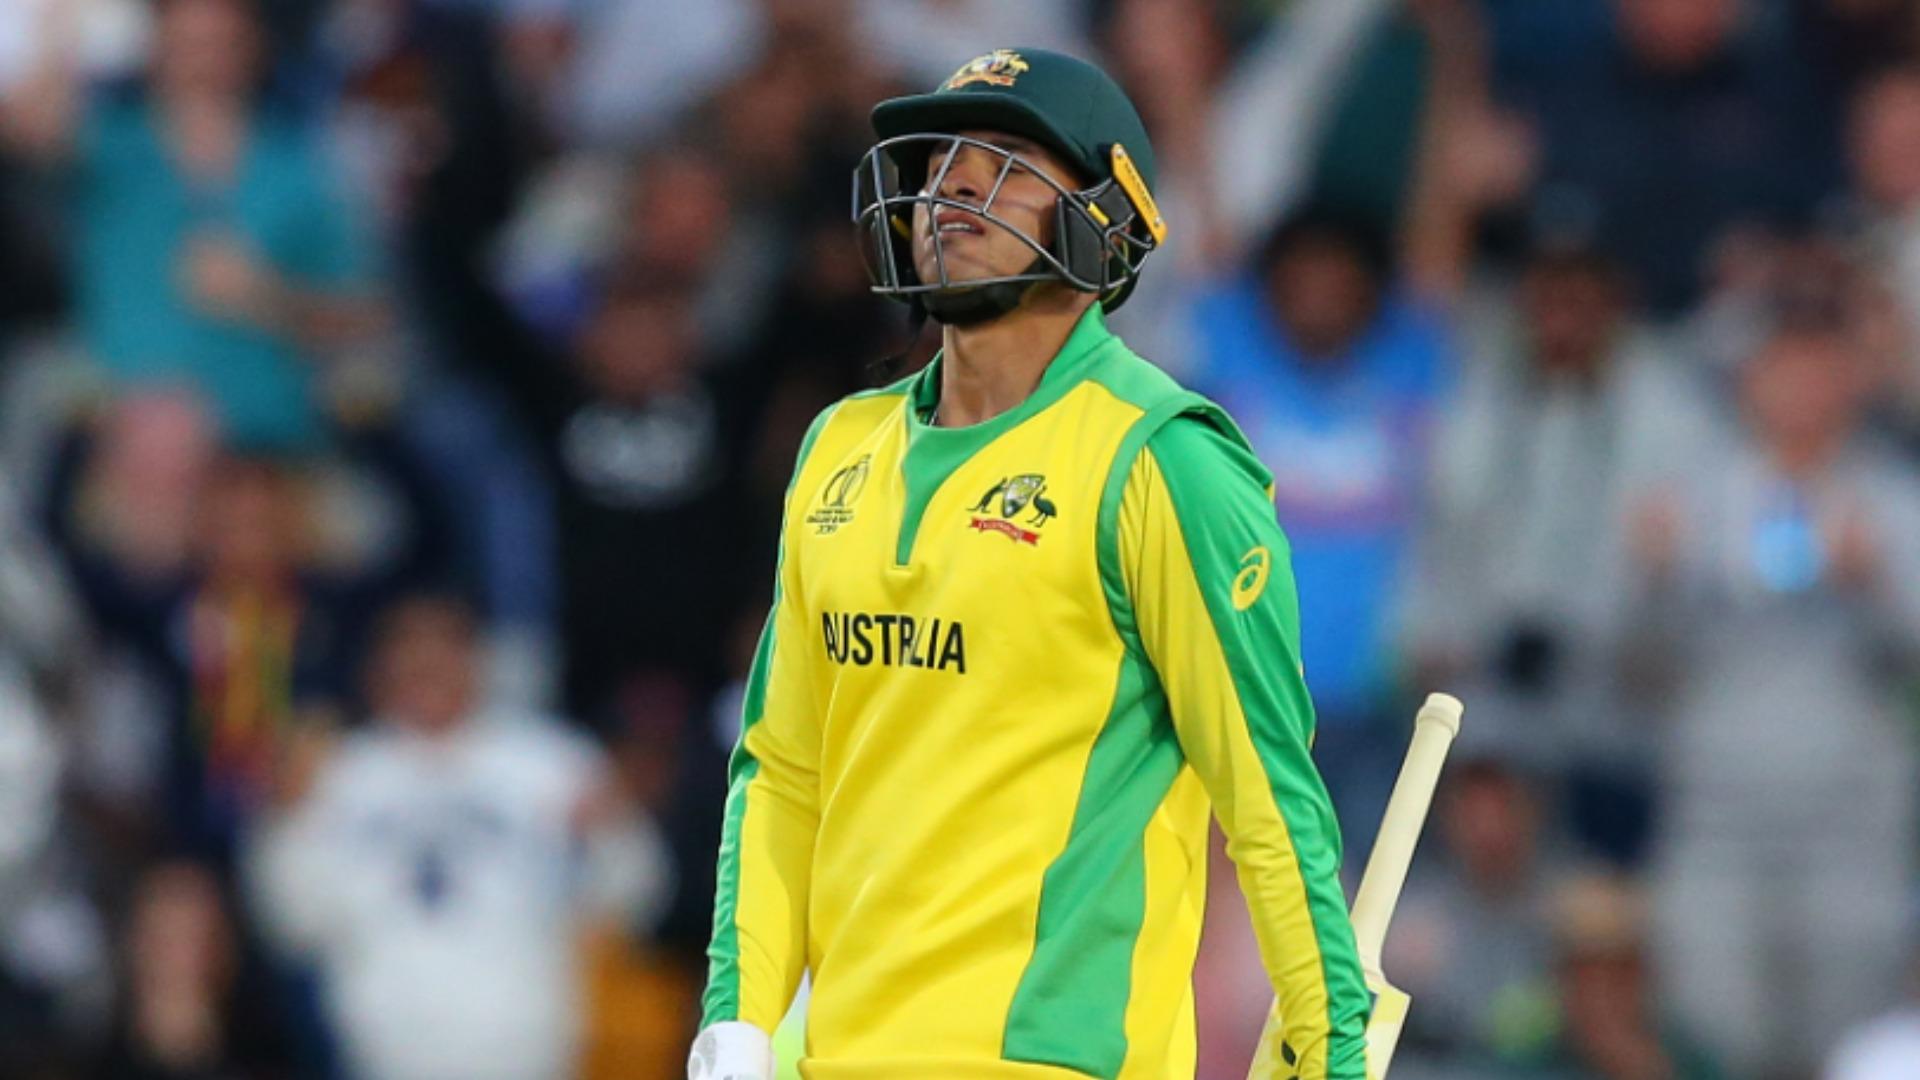 Khawaja set to miss England semi-final for Australia